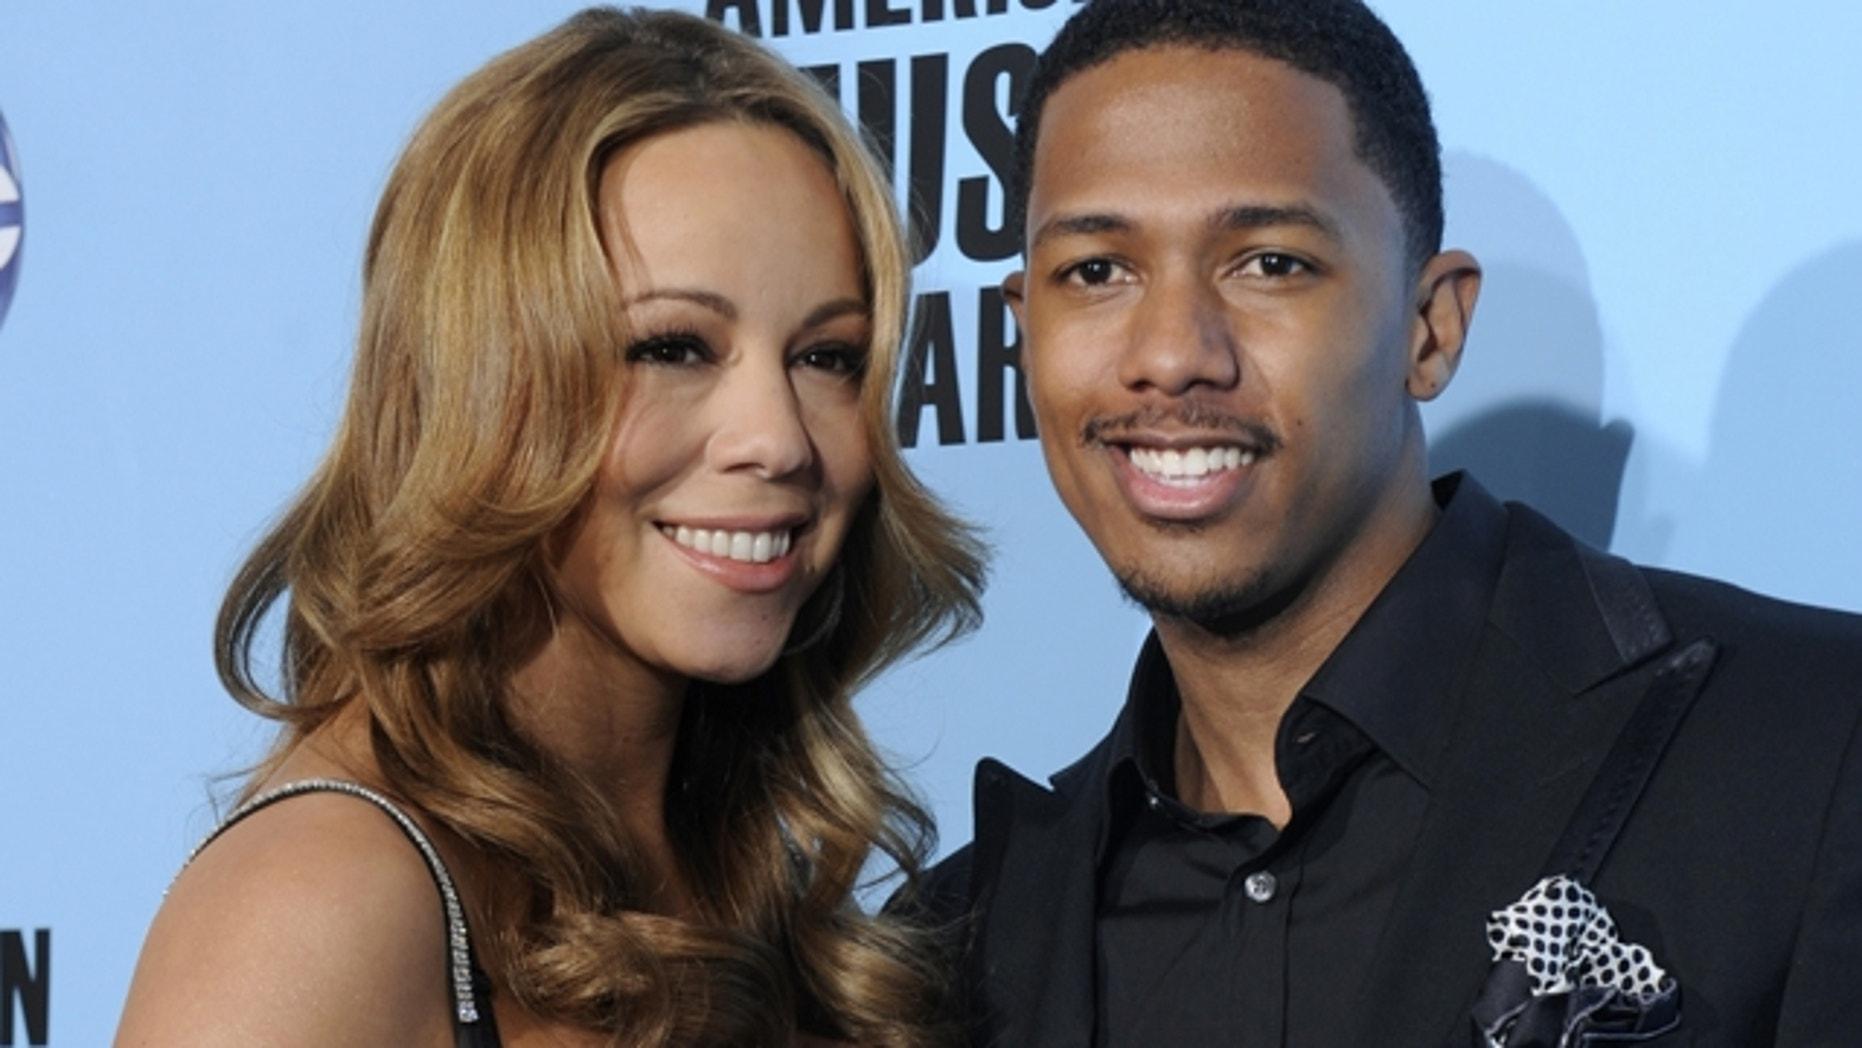 NFL Draft, Mariah Carey has Twins and the Royal Honeymoon